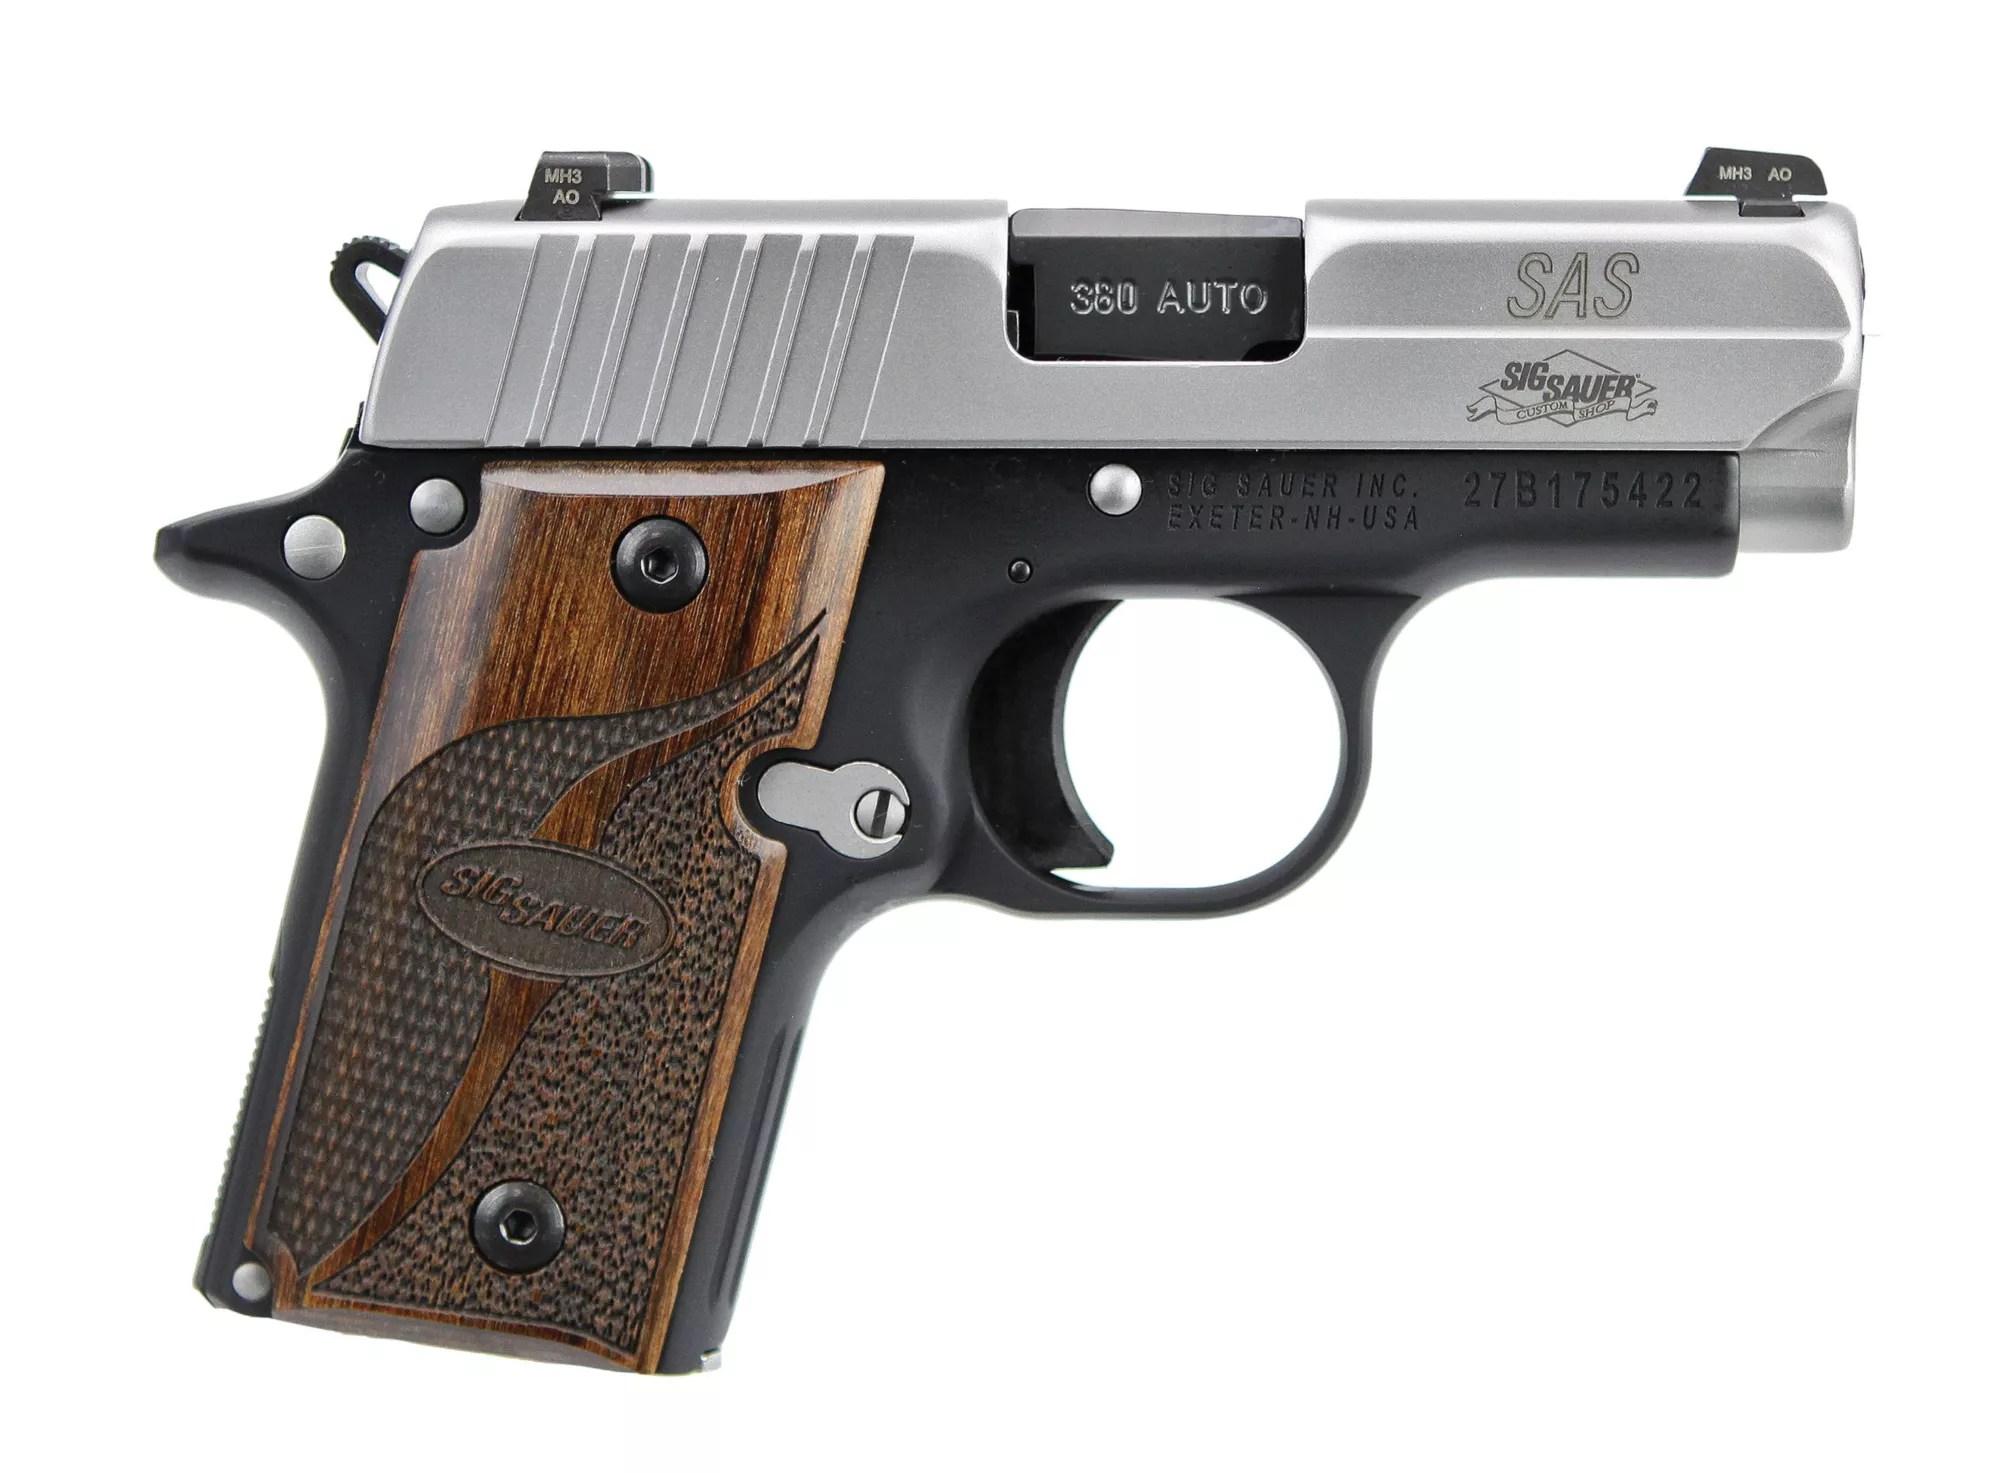 sig sauer p238 micro compact pistol 1 [ 1080 x 796 Pixel ]